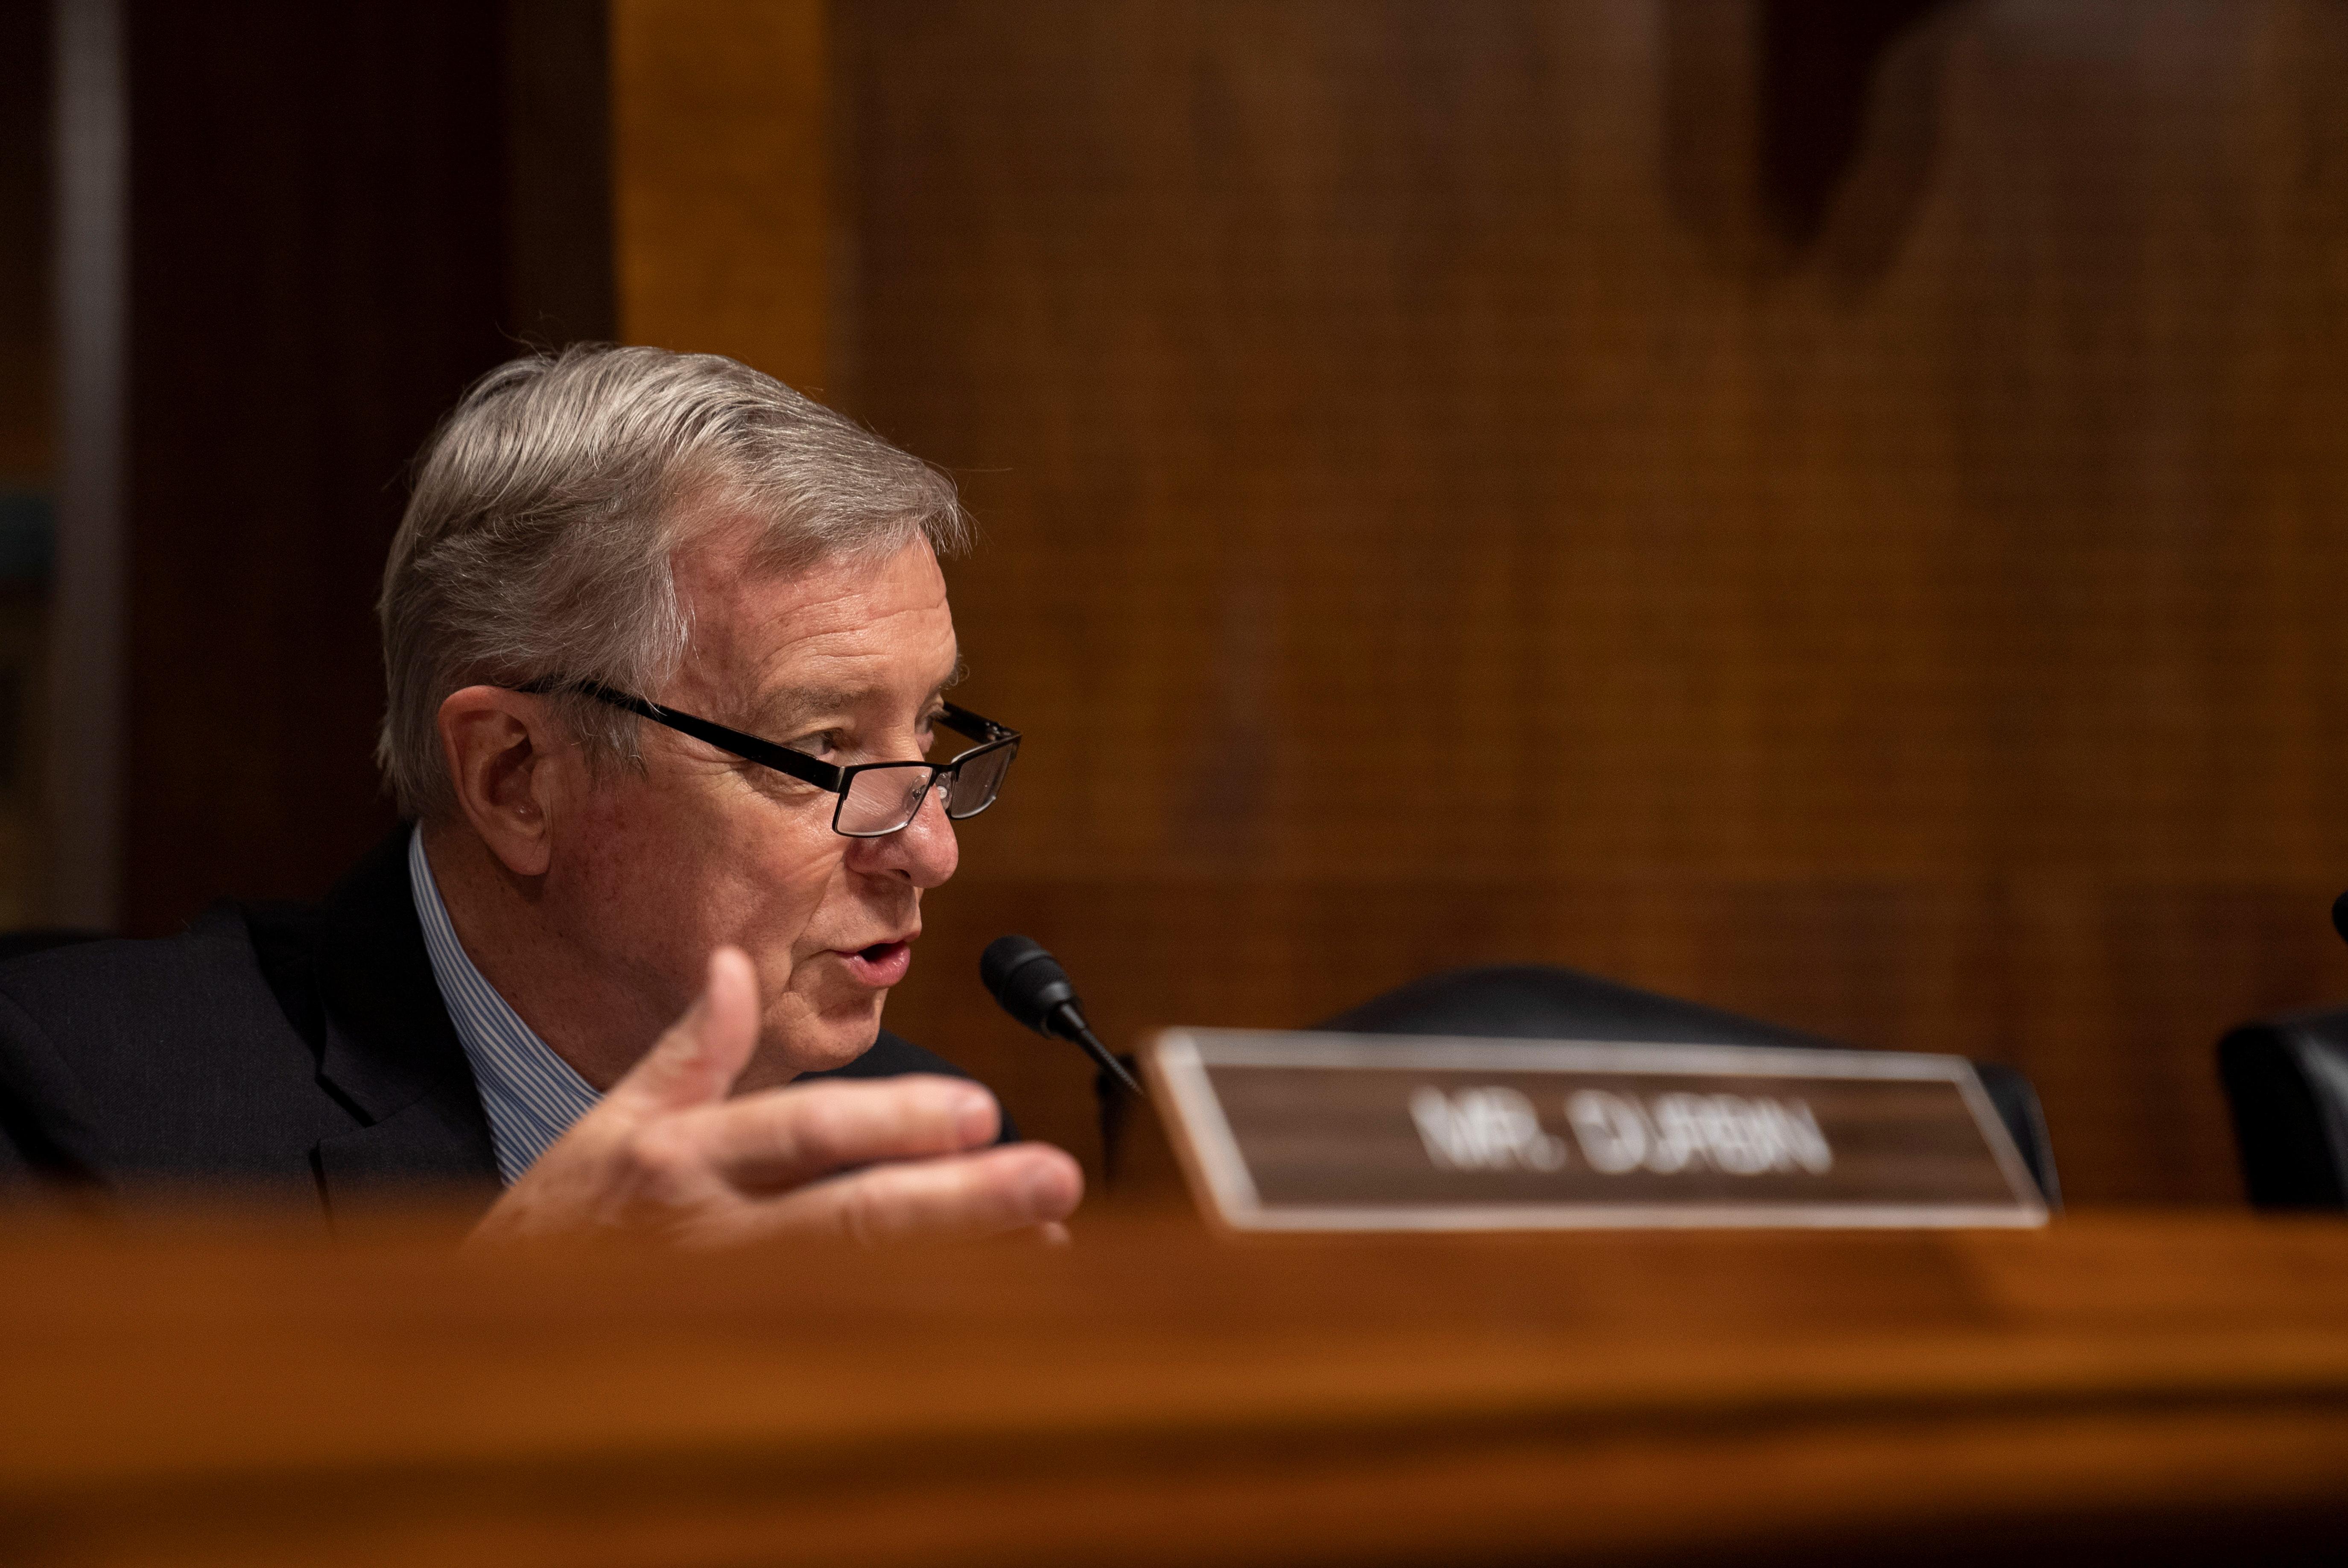 Democrats weigh all options after Republicans block gov't funding bill -Durbin